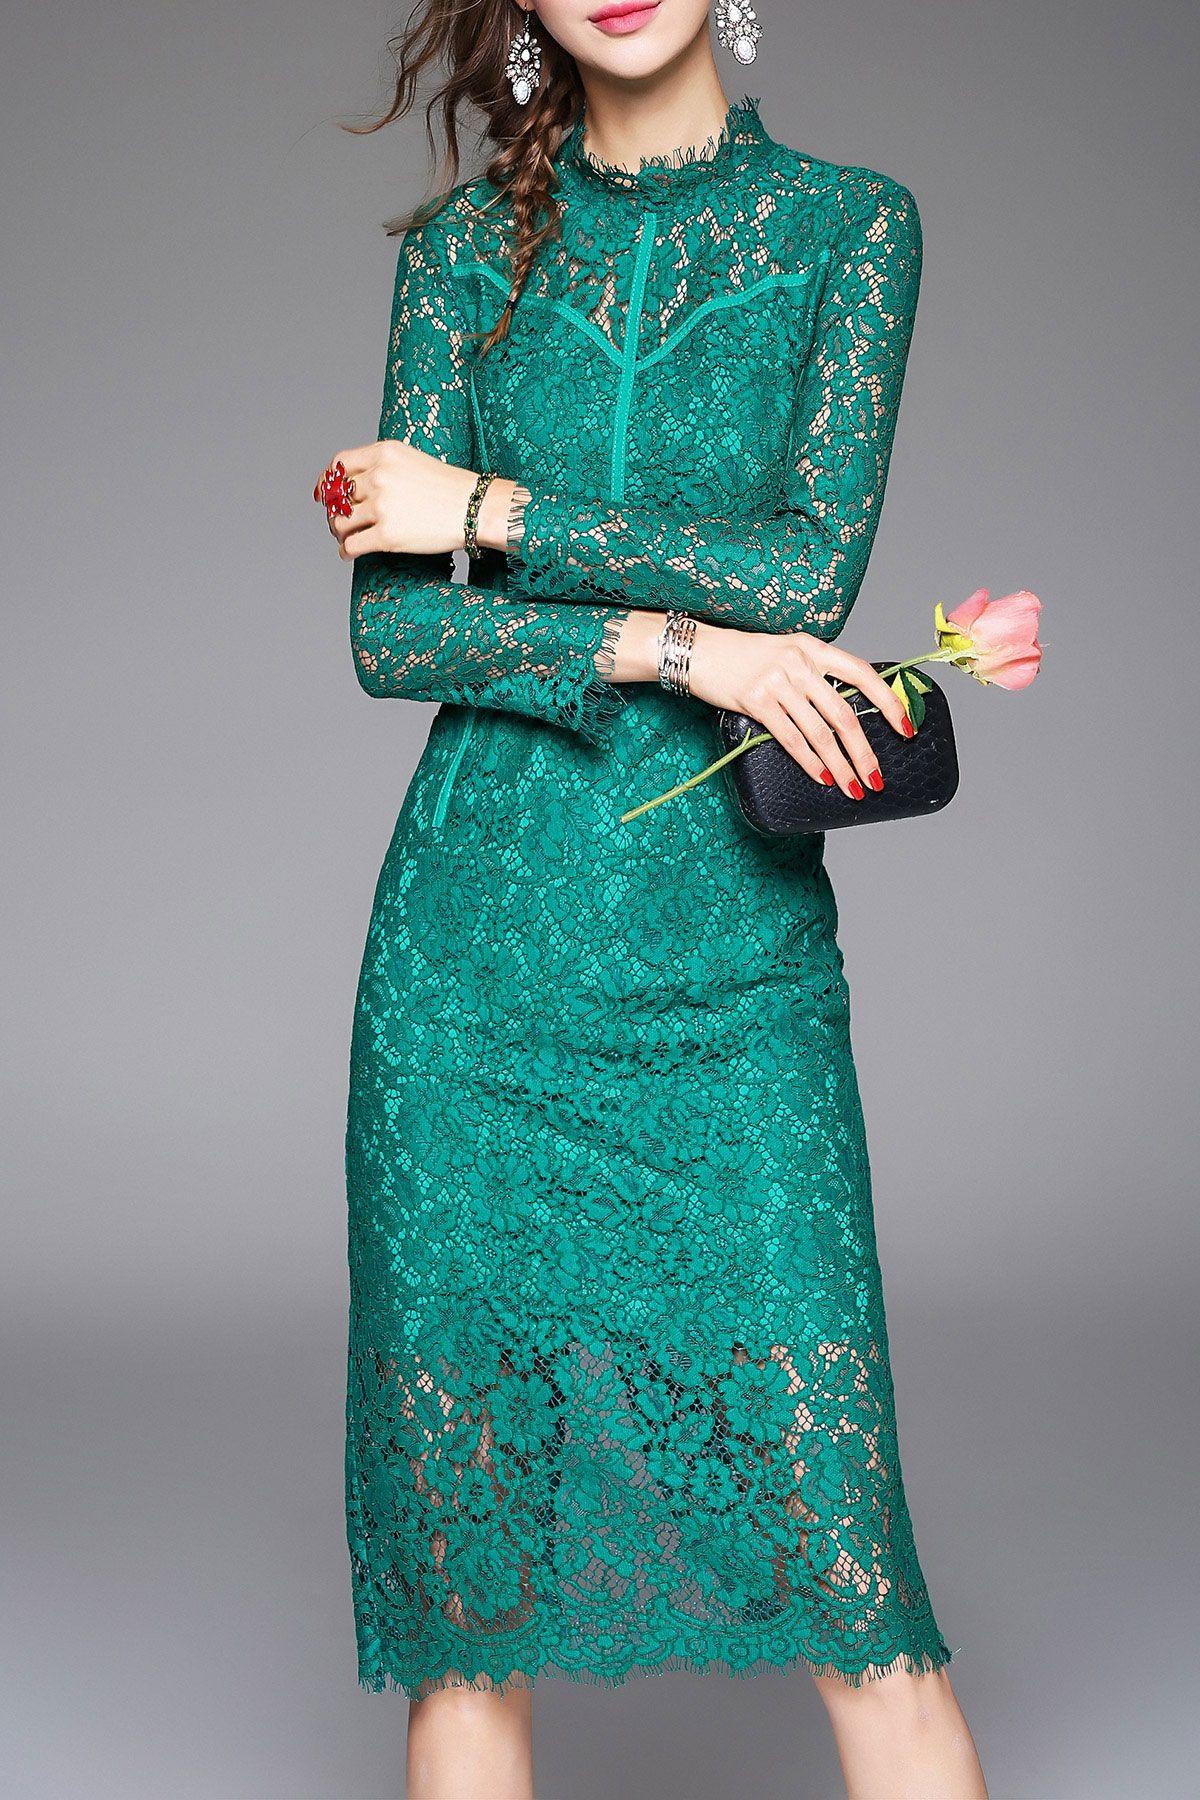 Acemiss green long sleeve lace midi dress midi dresses